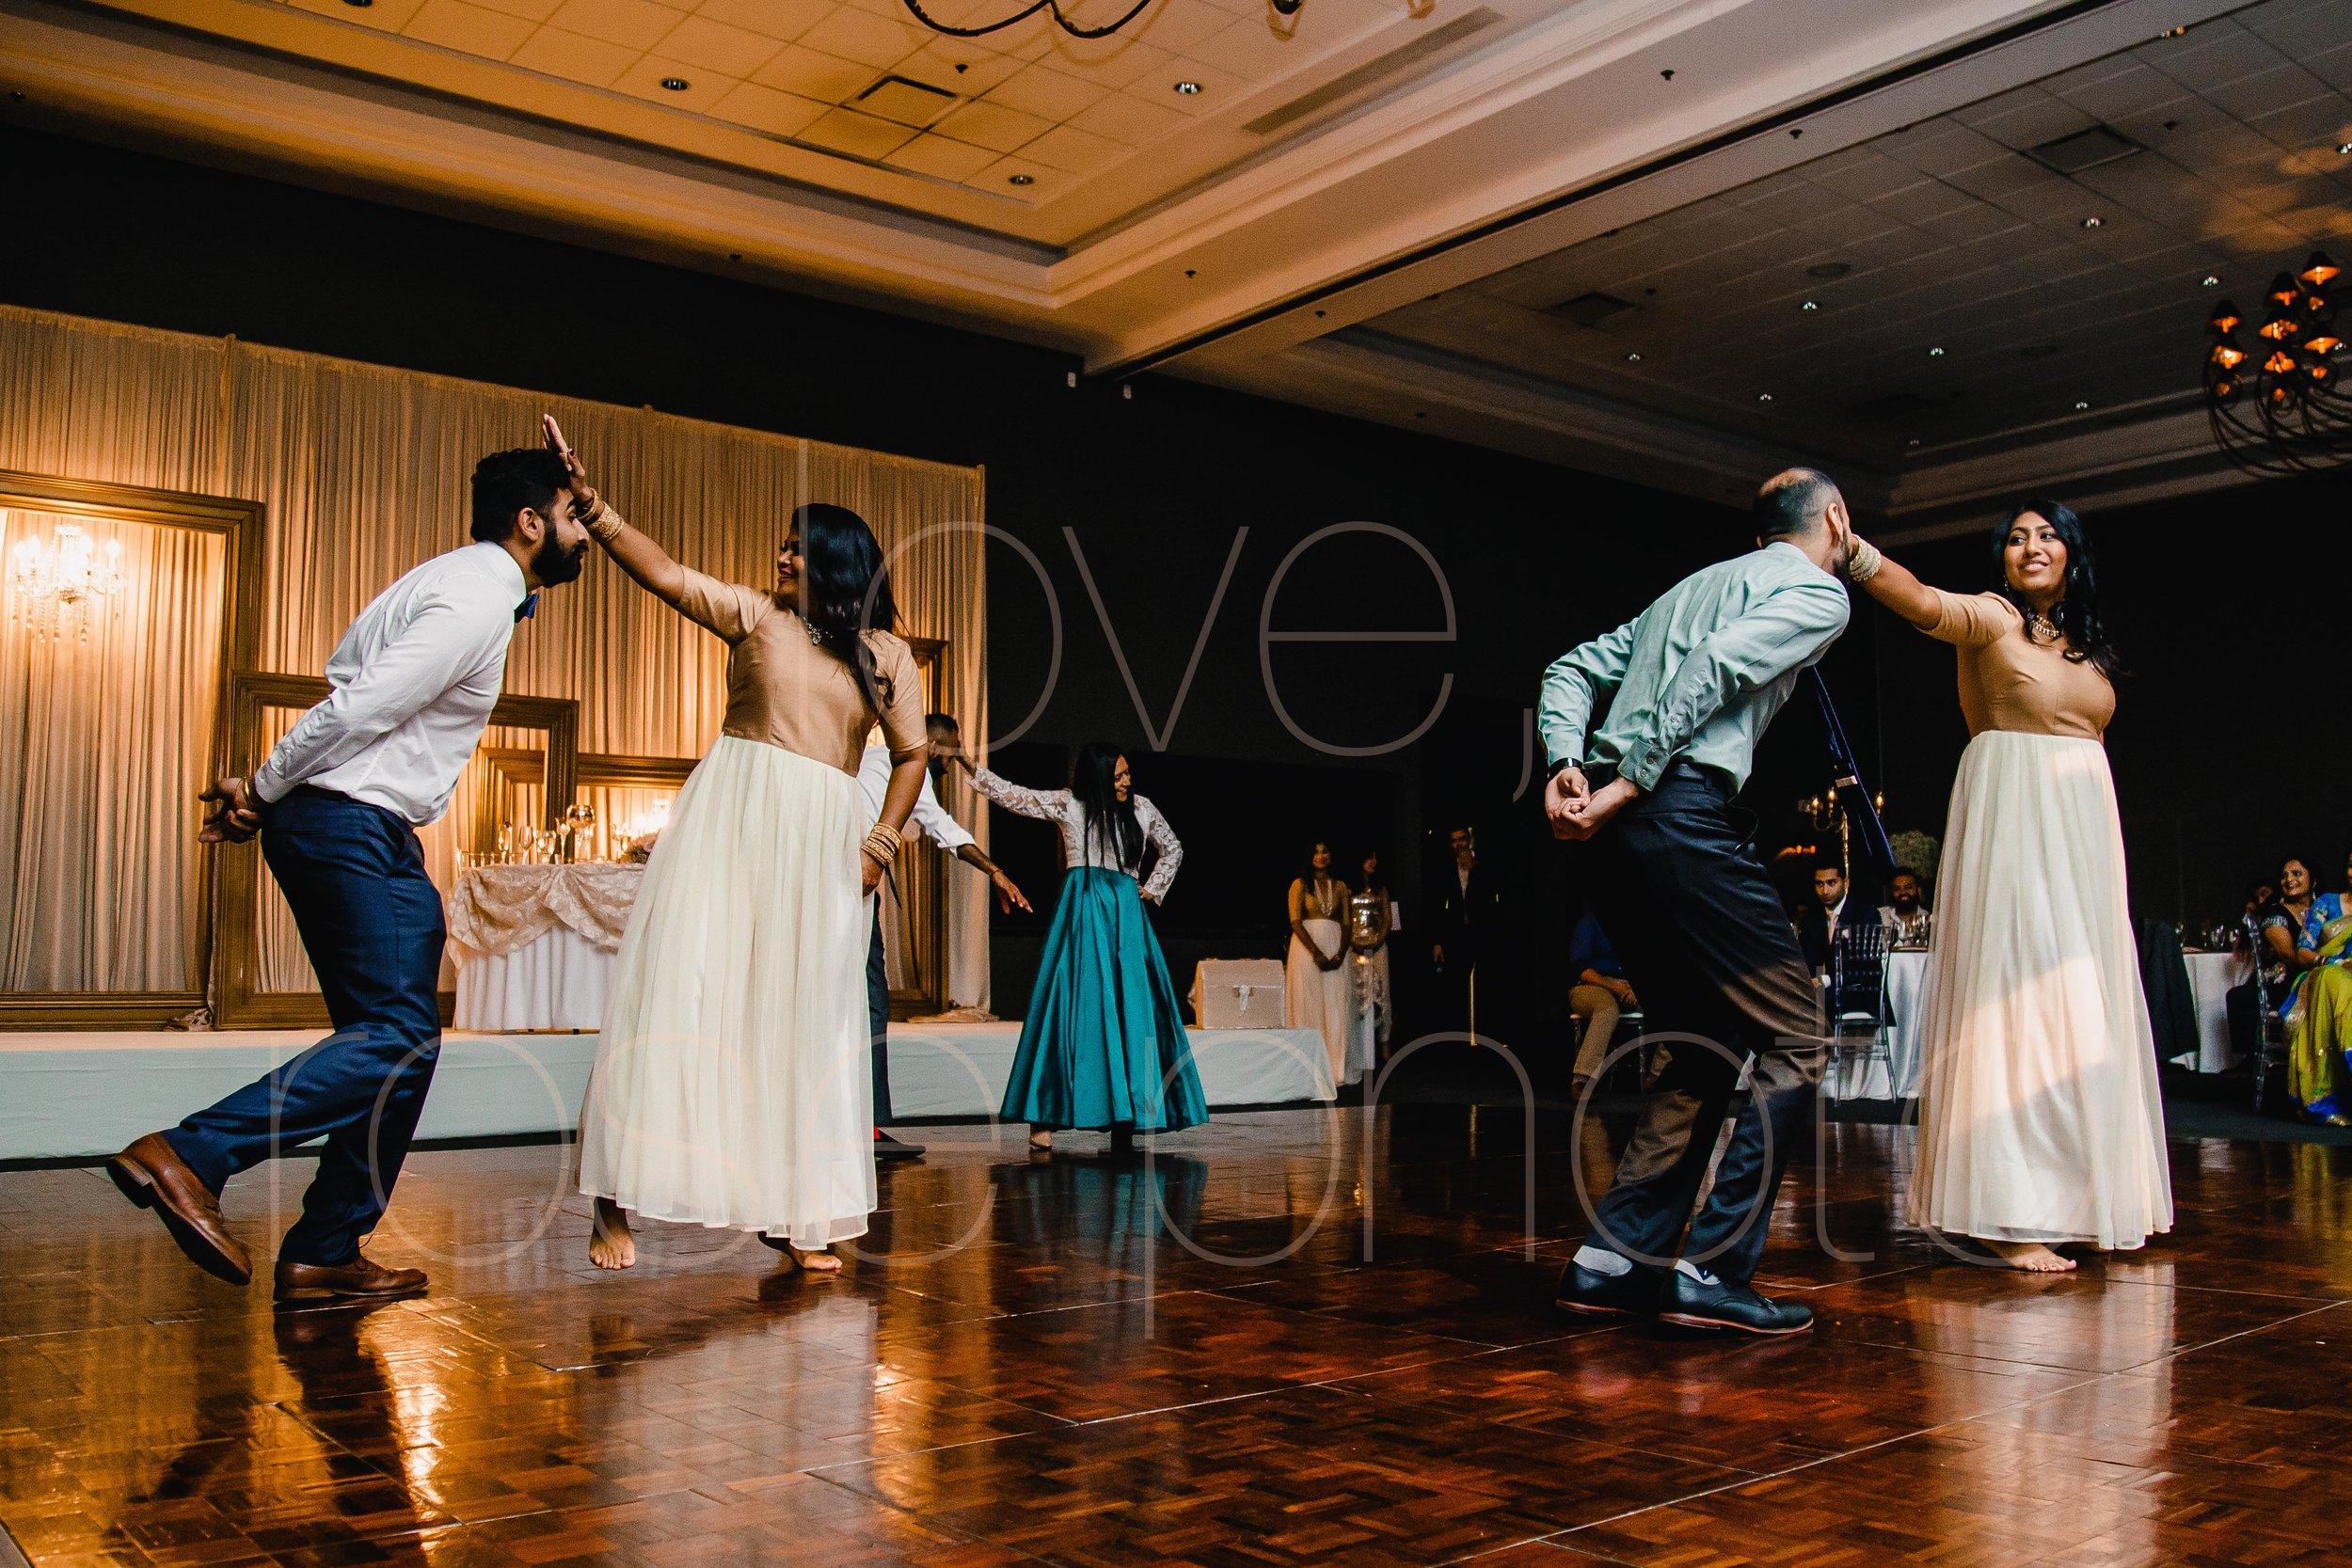 Chicago Indian Wedding best photography lifestyle wedding portrait luxury wedding-68.jpg